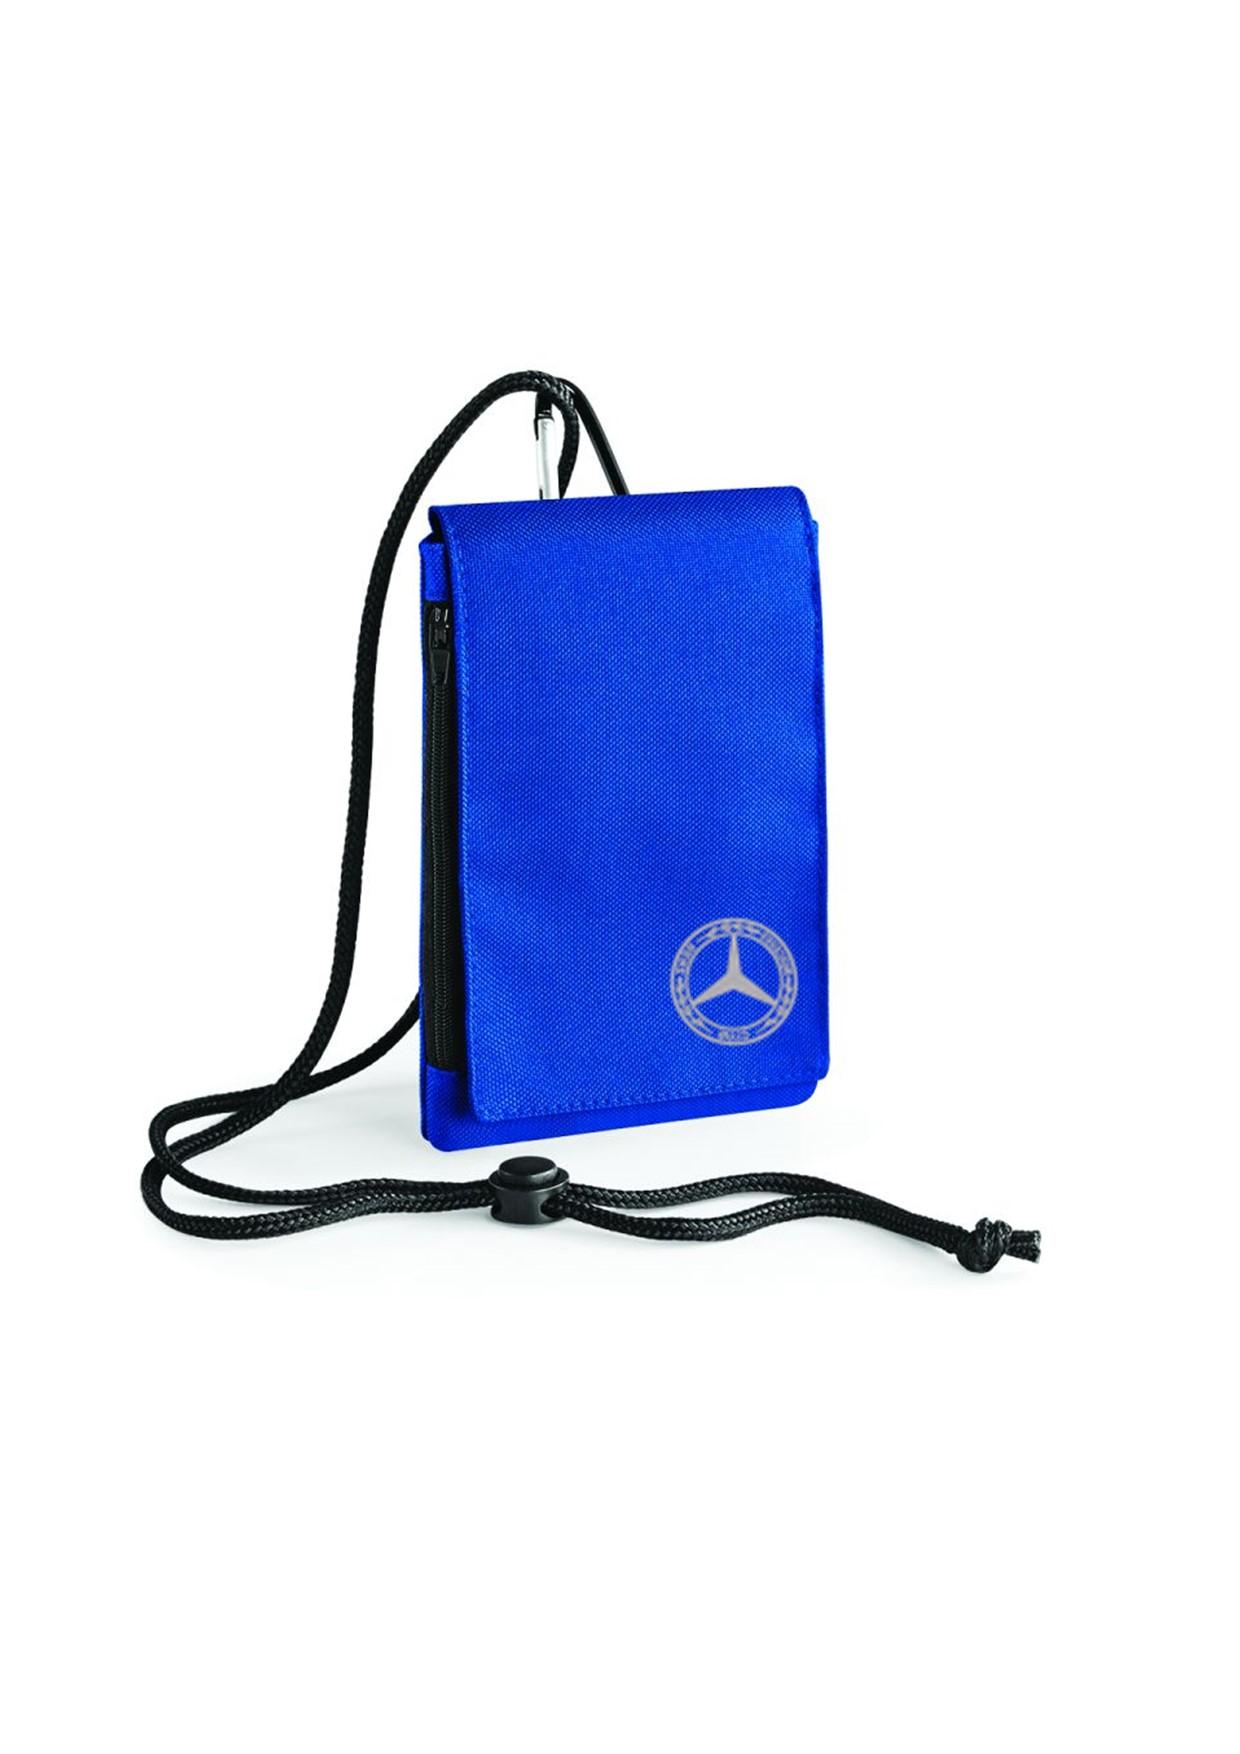 Mercedes Benz Club XL Phone Bag Royal Blue